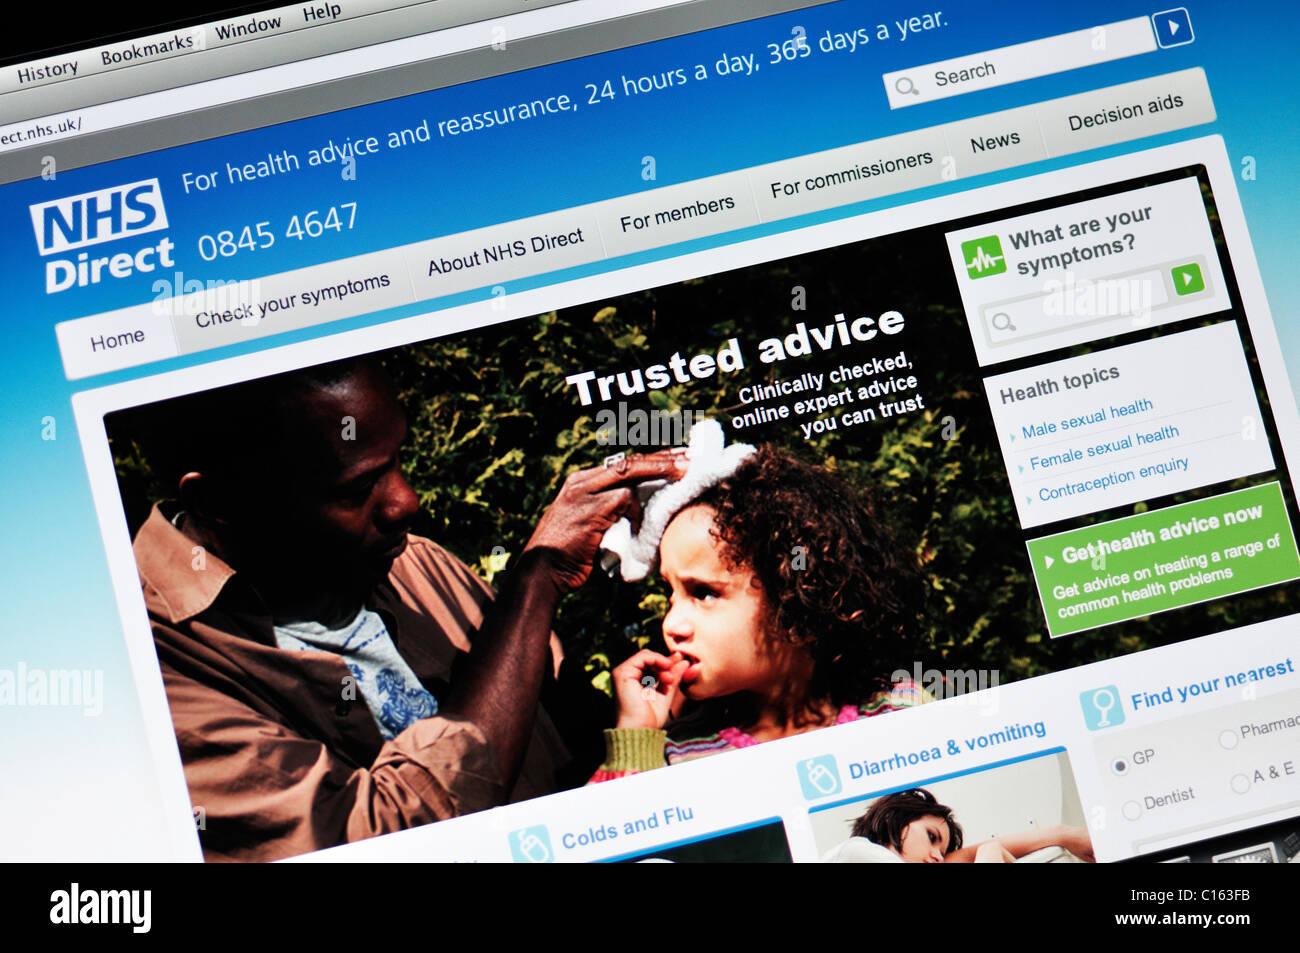 NHS Direct website - Stock Image